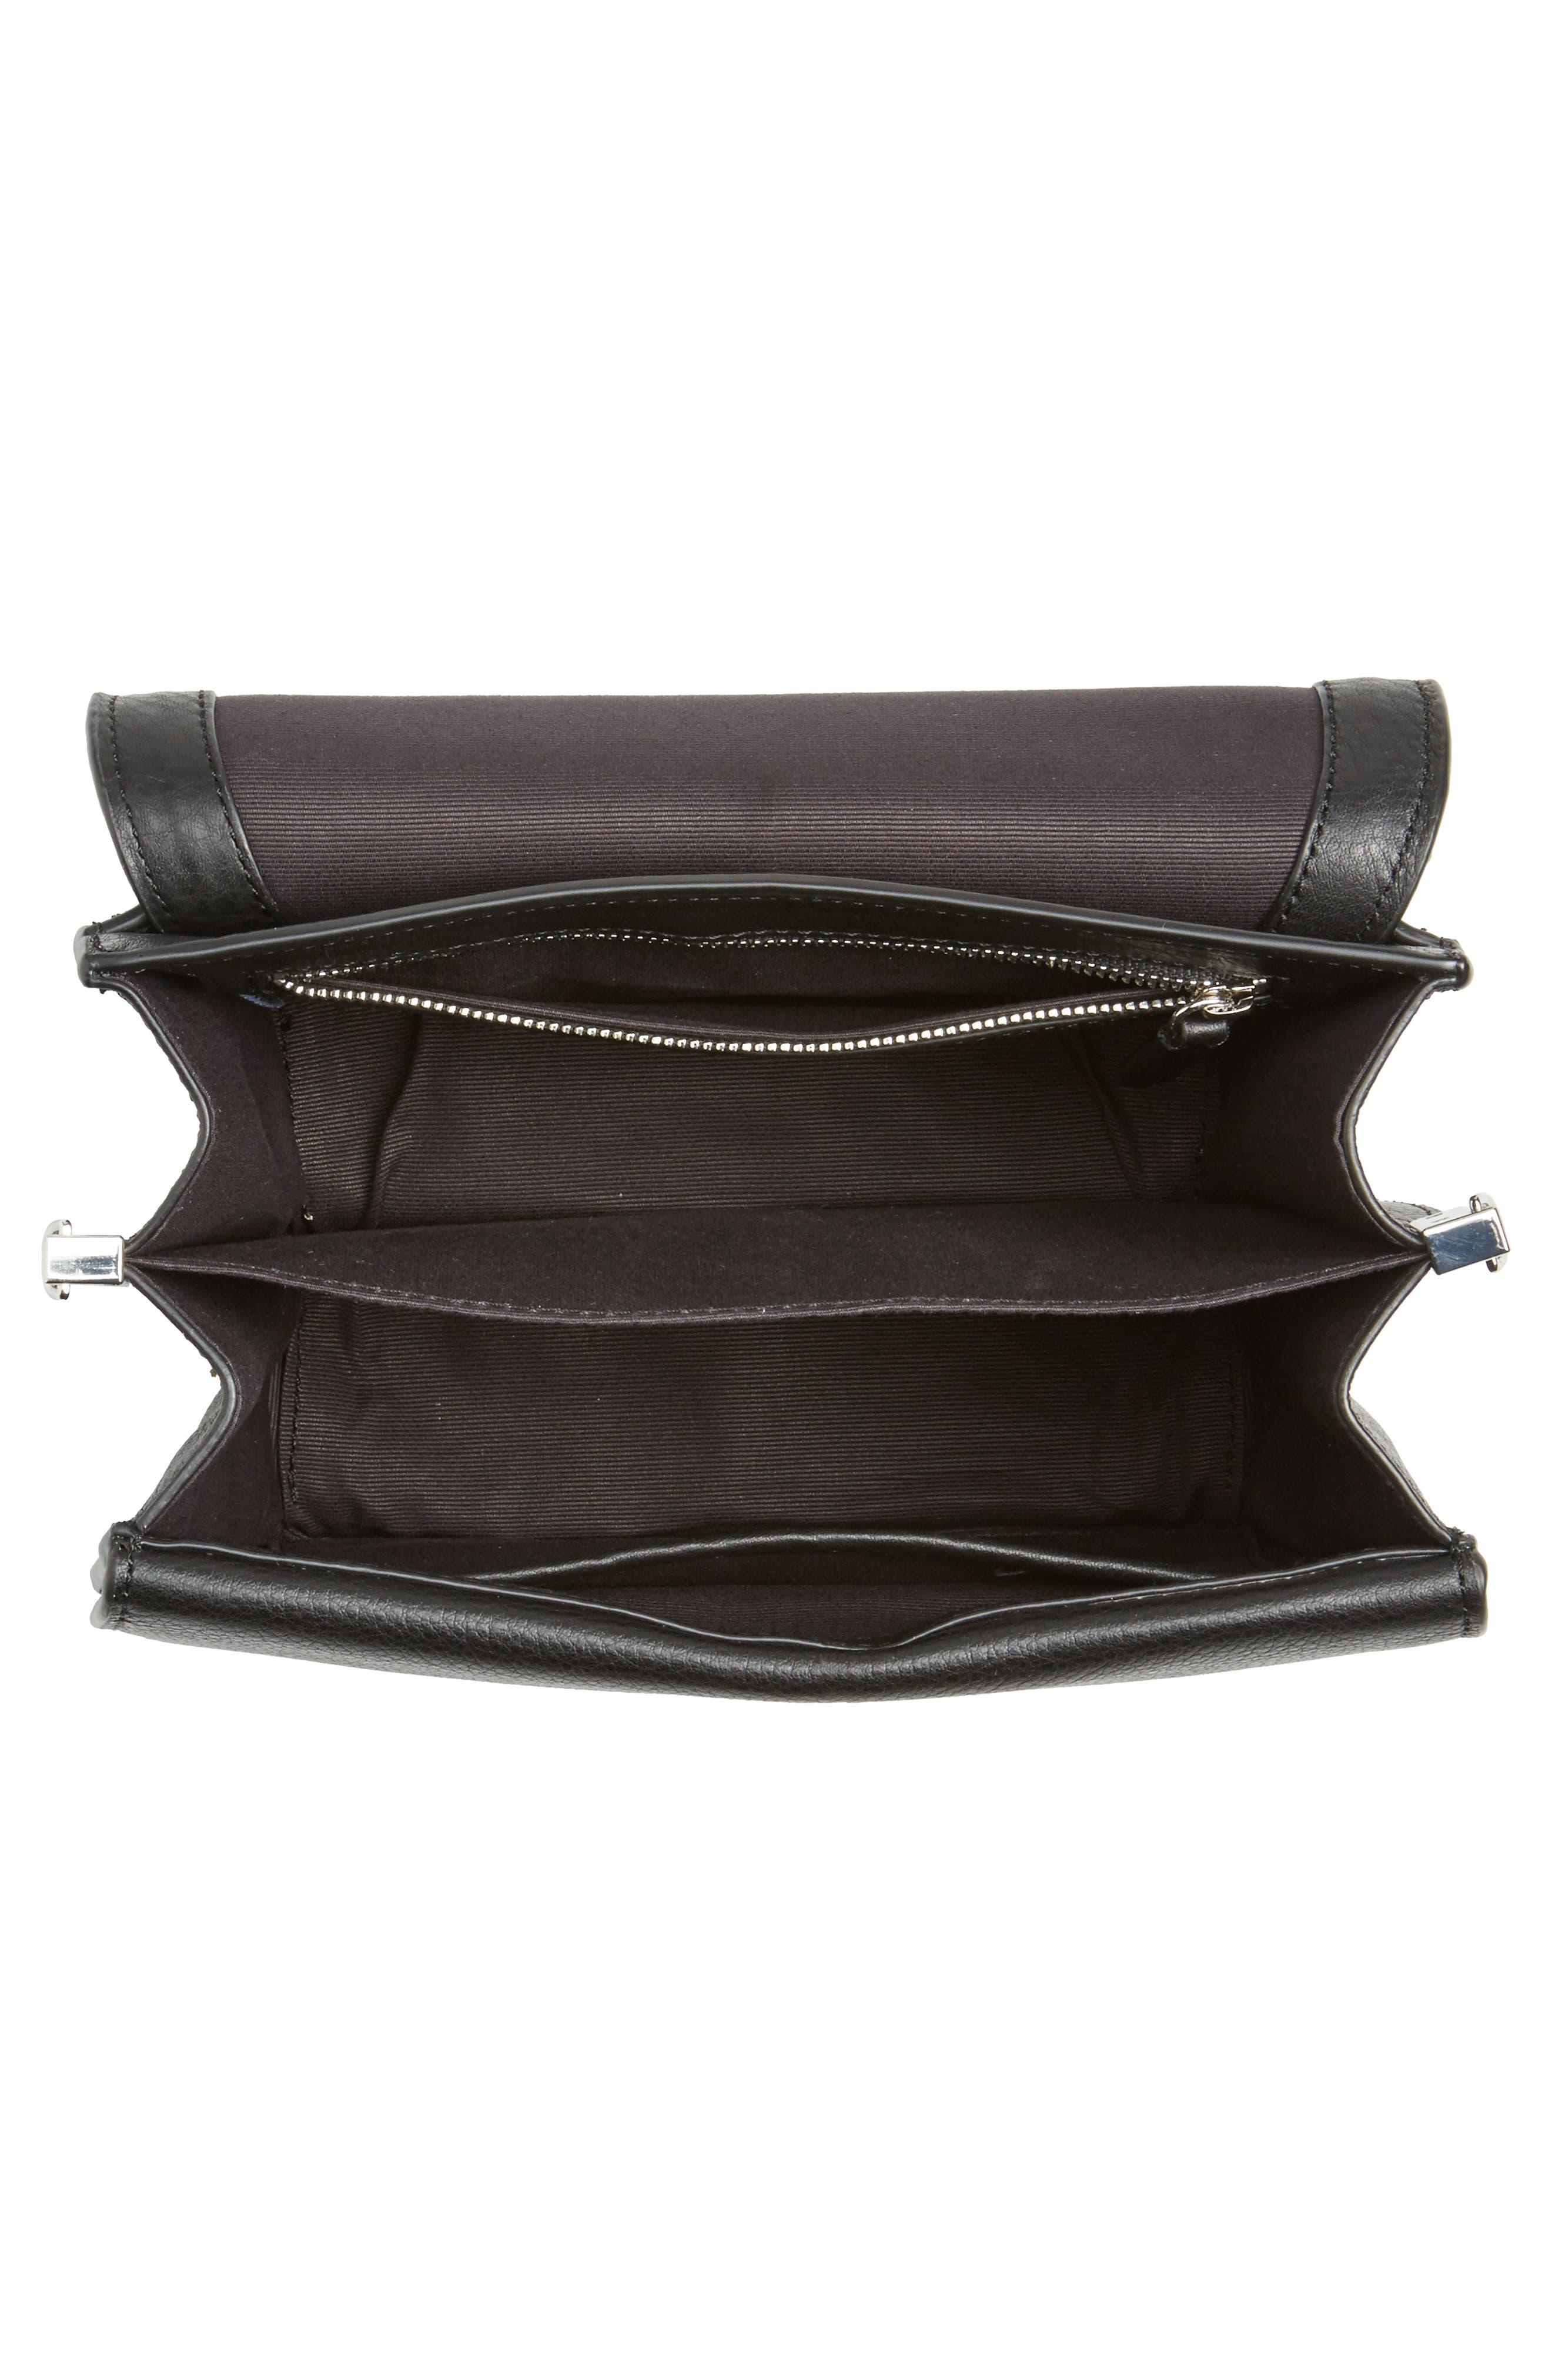 Landon Leather Crossbody Saddle Bag,                             Alternate thumbnail 13, color,